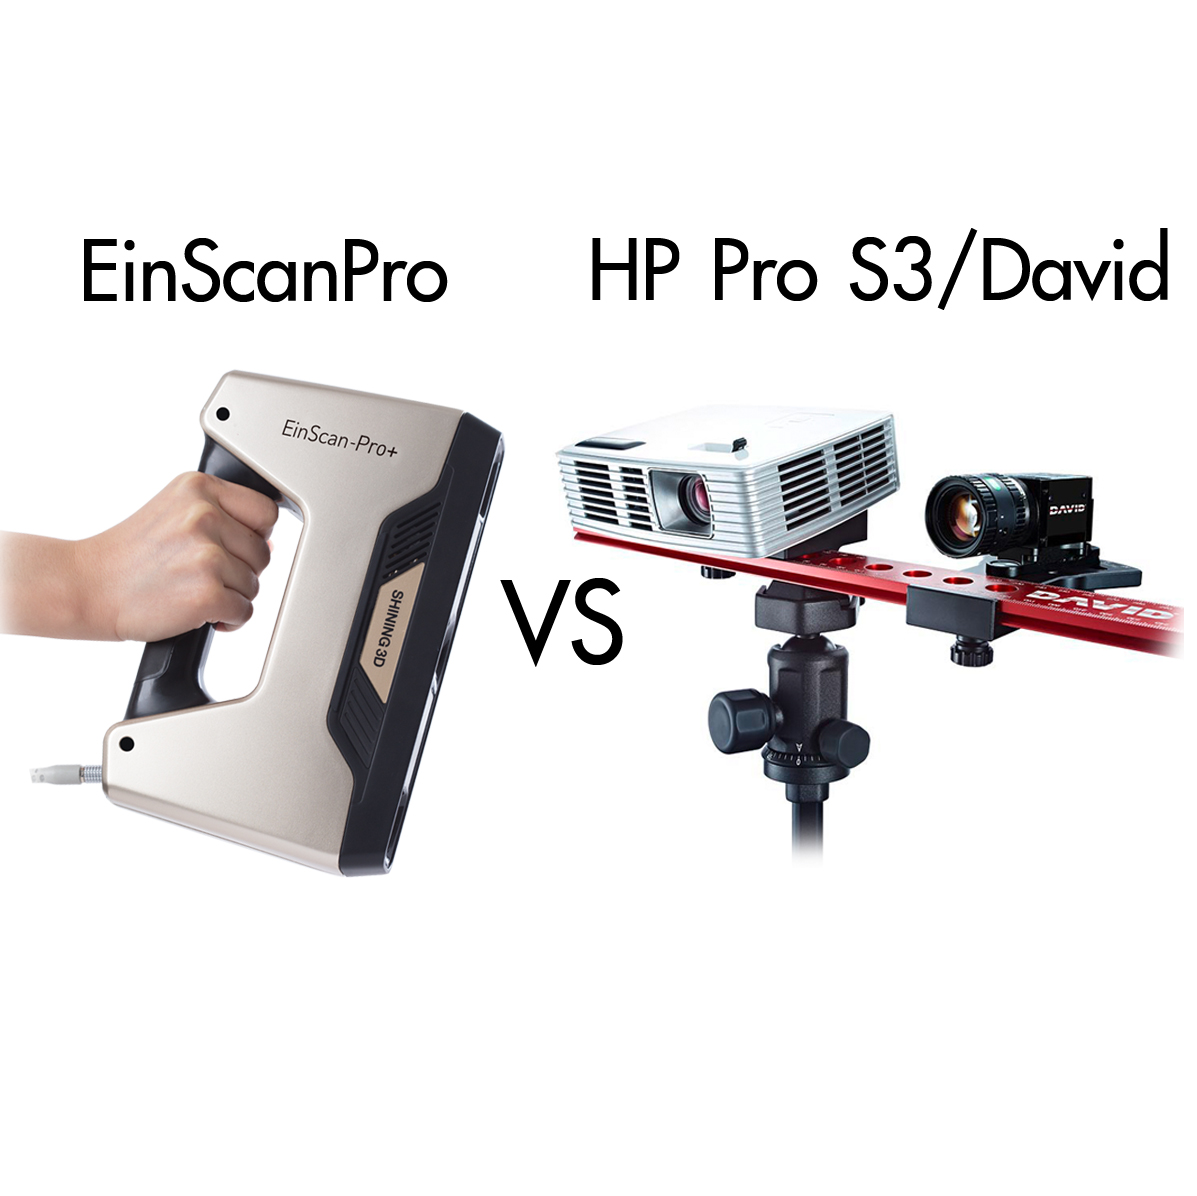 EinPro VS HP